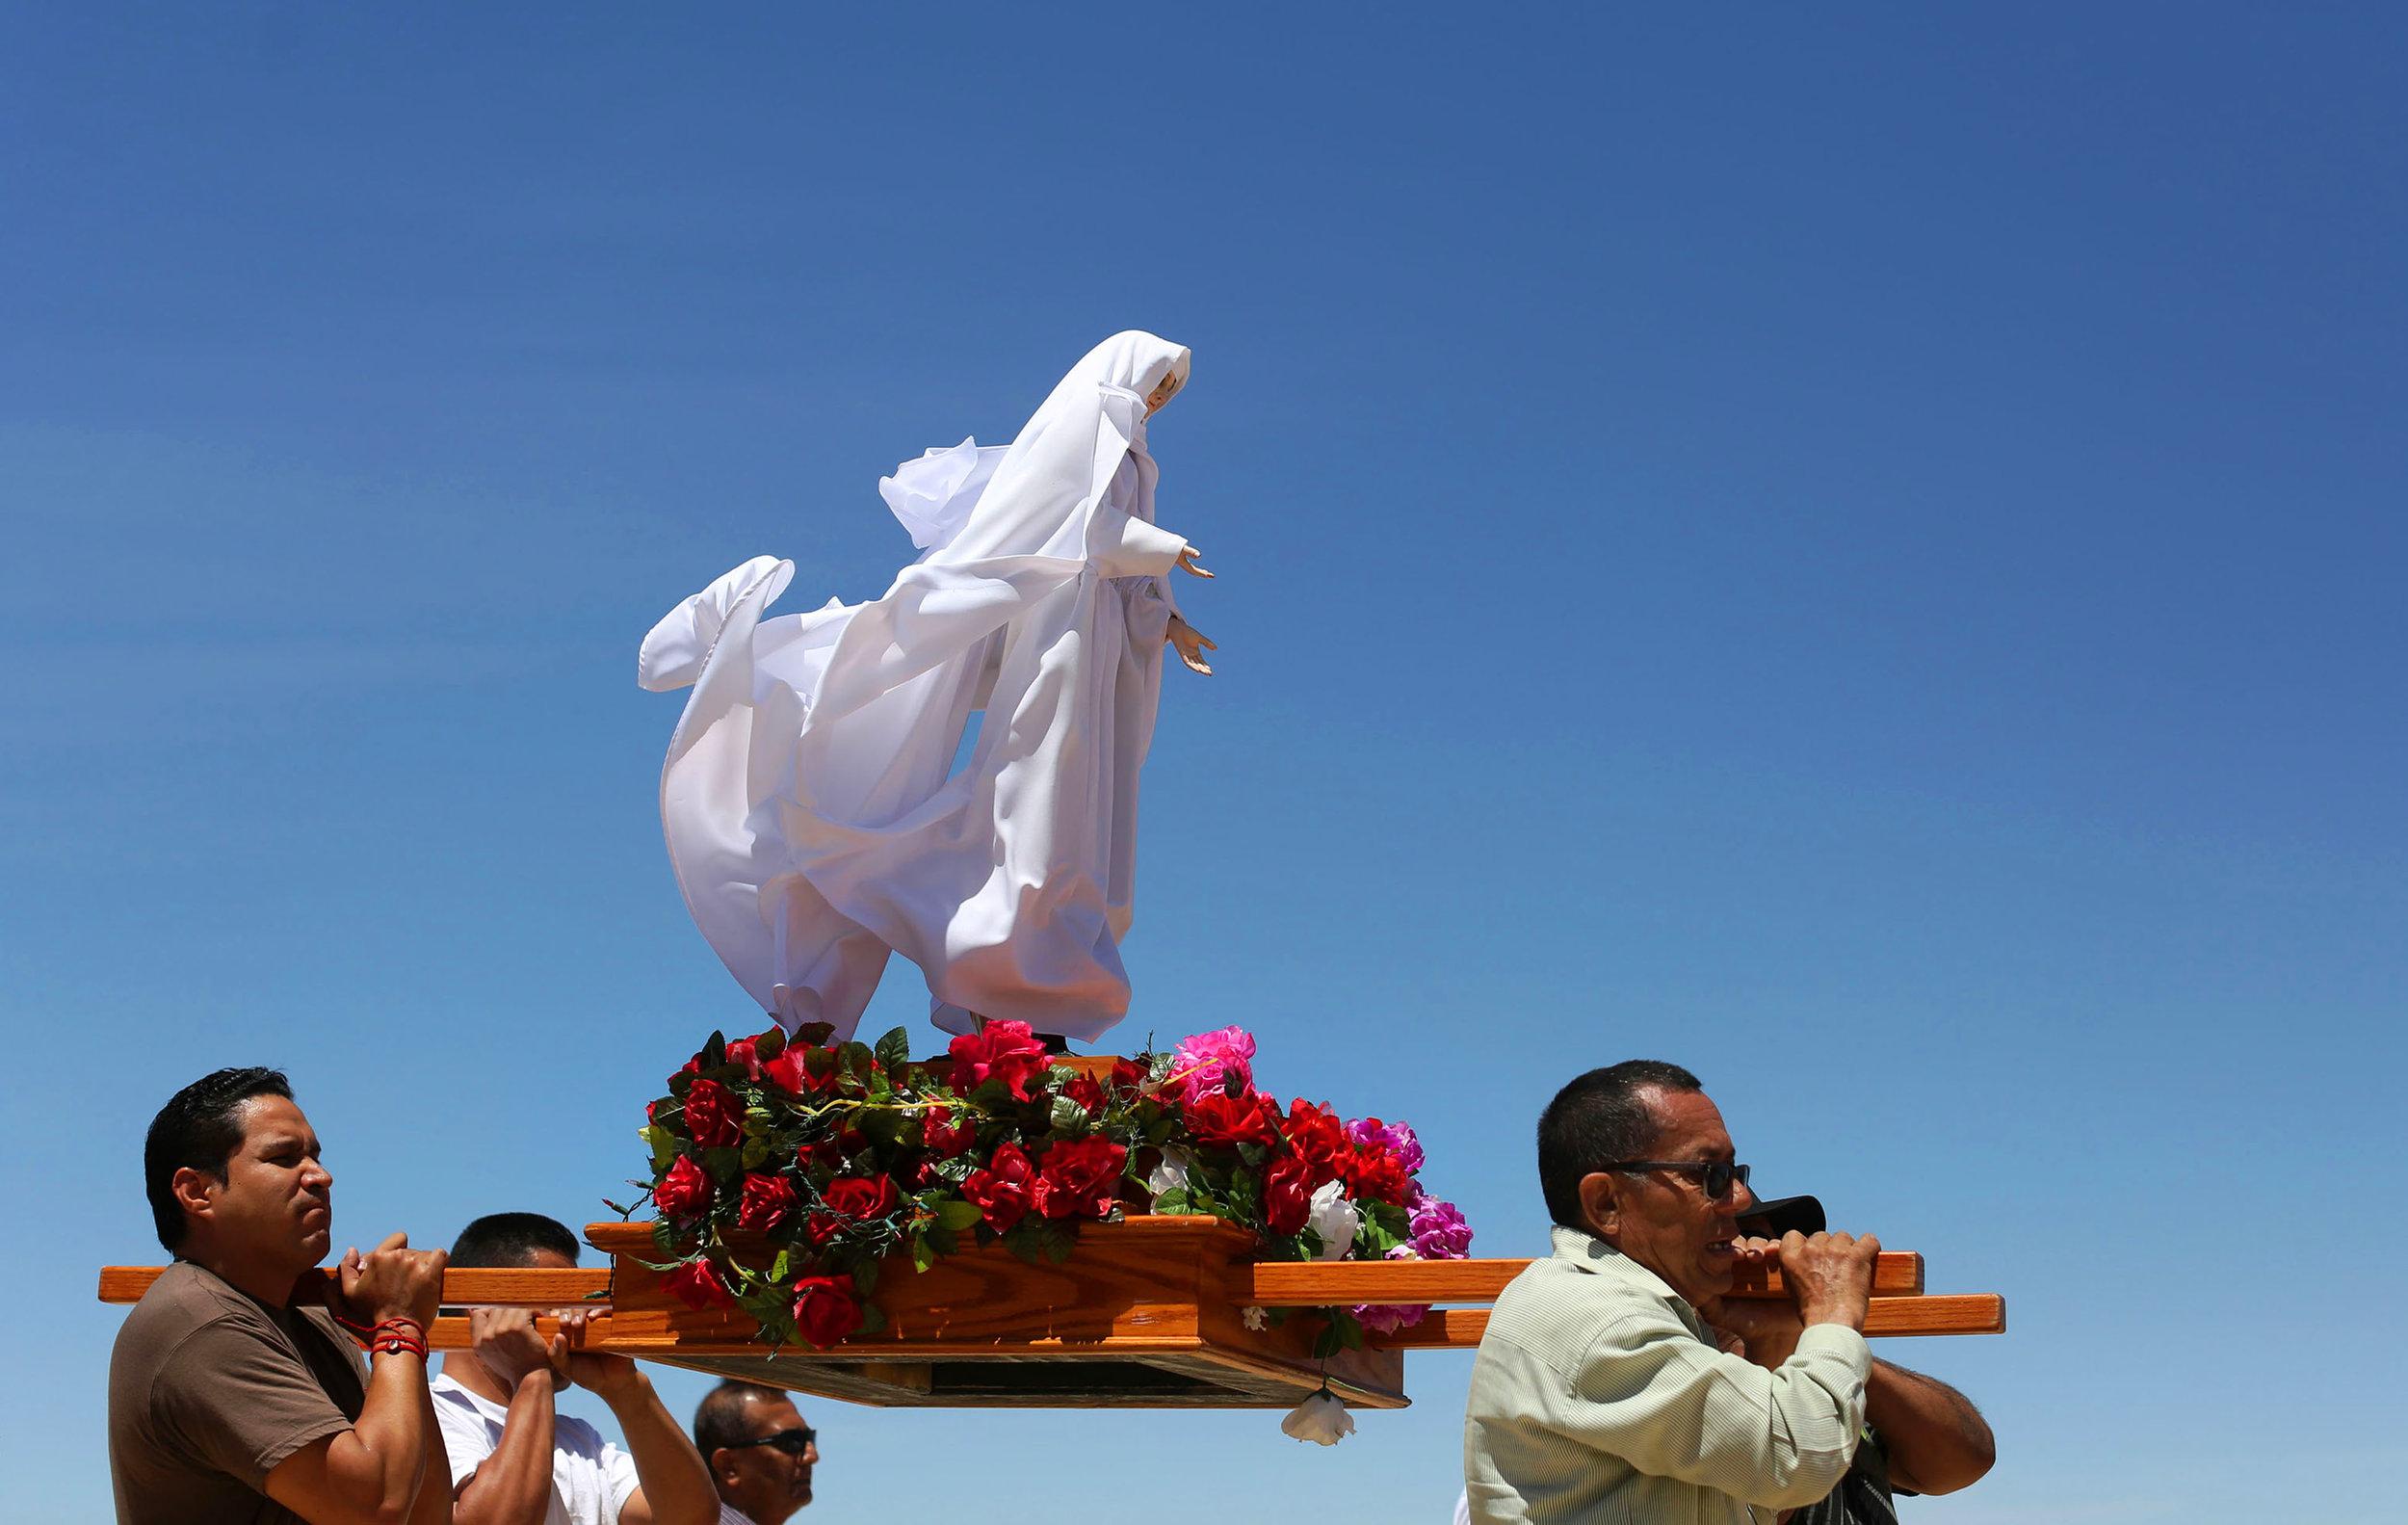 Virgen del Desierto, Mojave, CA